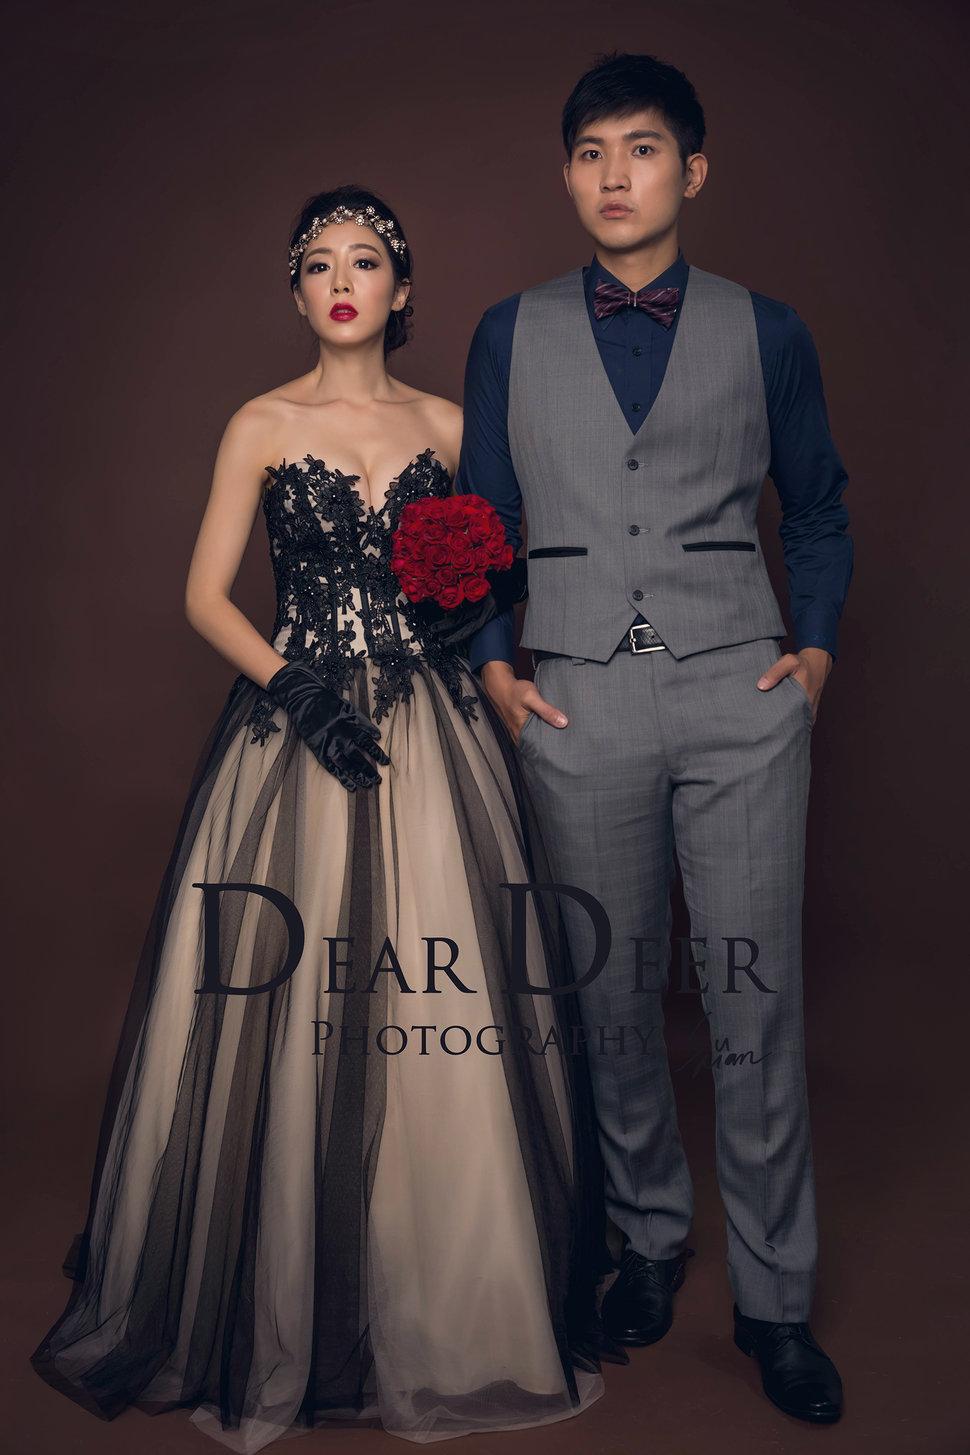 Dear Deer|經典韓系棚拍(編號:2403901) - Dear Deer鹿兒攝影|女攝影師蘇蔓 - 結婚吧